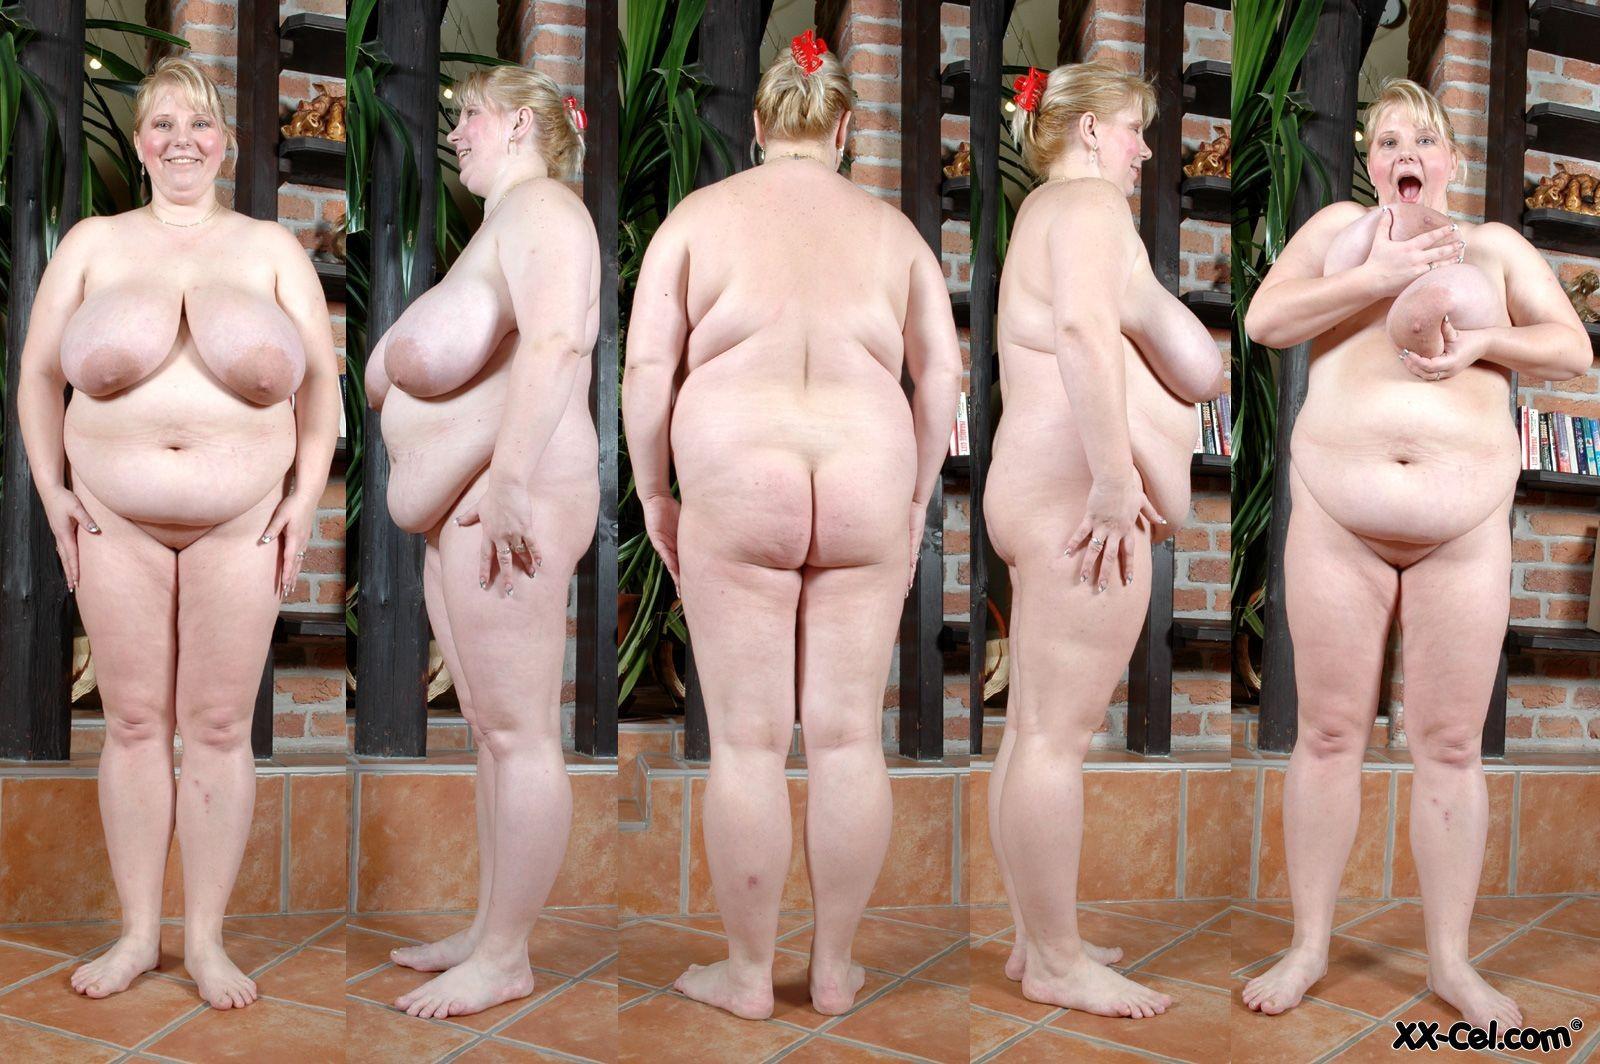 from Jack nude bbw women standing